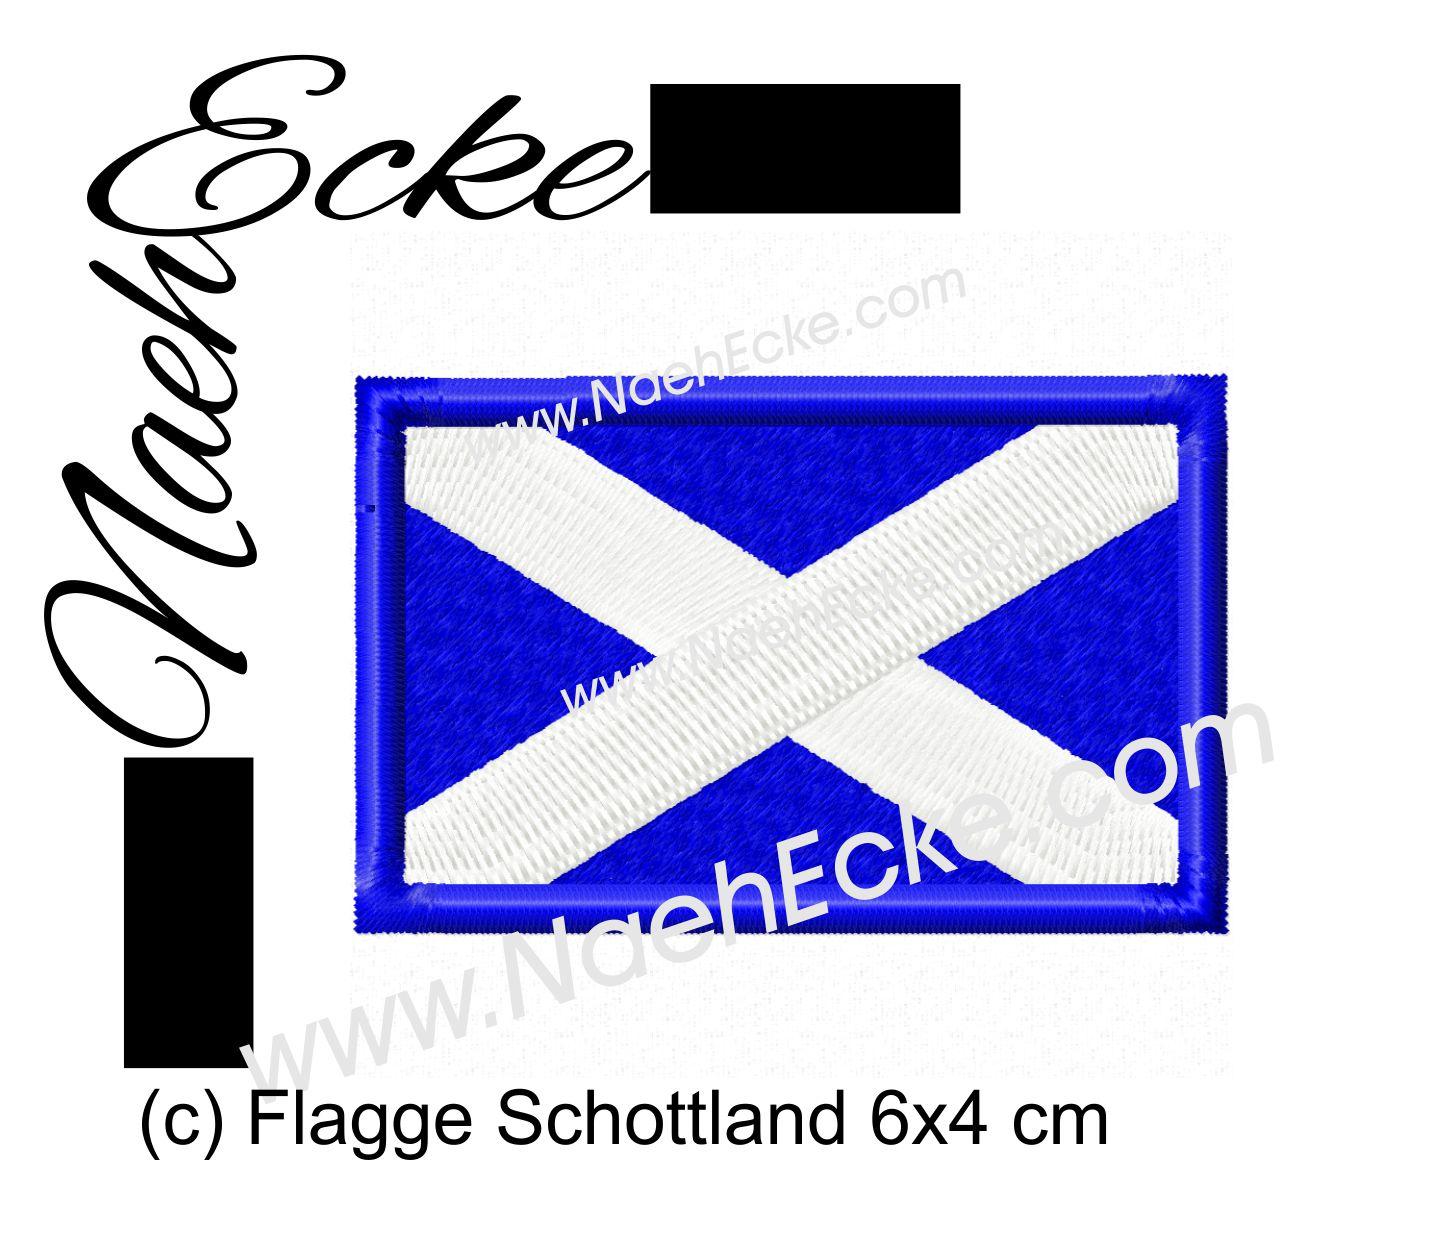 Flagge Schottland